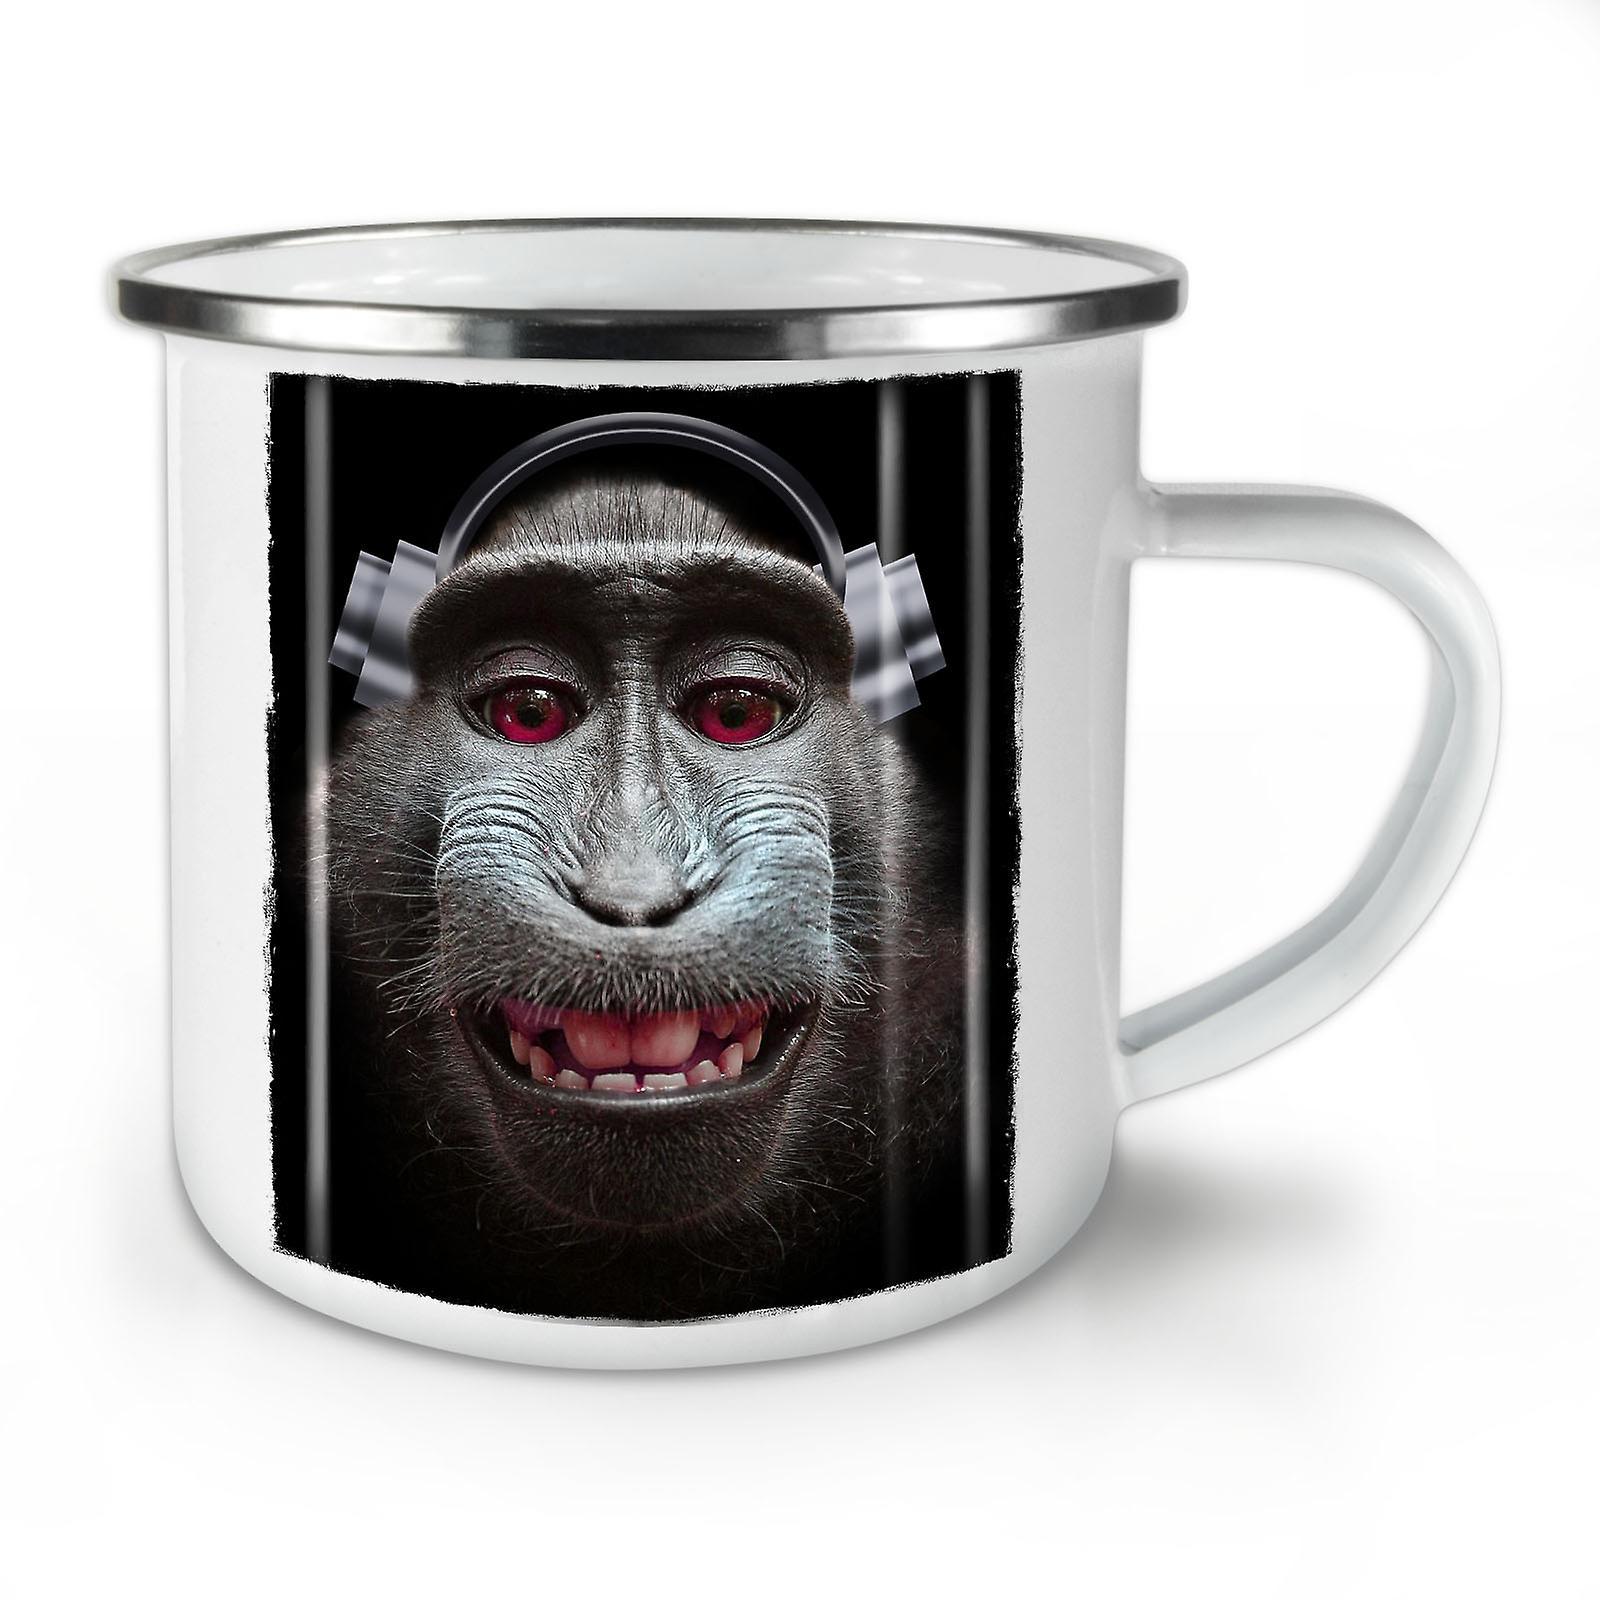 Singe Émail OzWellcoda Chanson Café Animal Whitetea Mug10 Nouvelle vN8nwOmy0